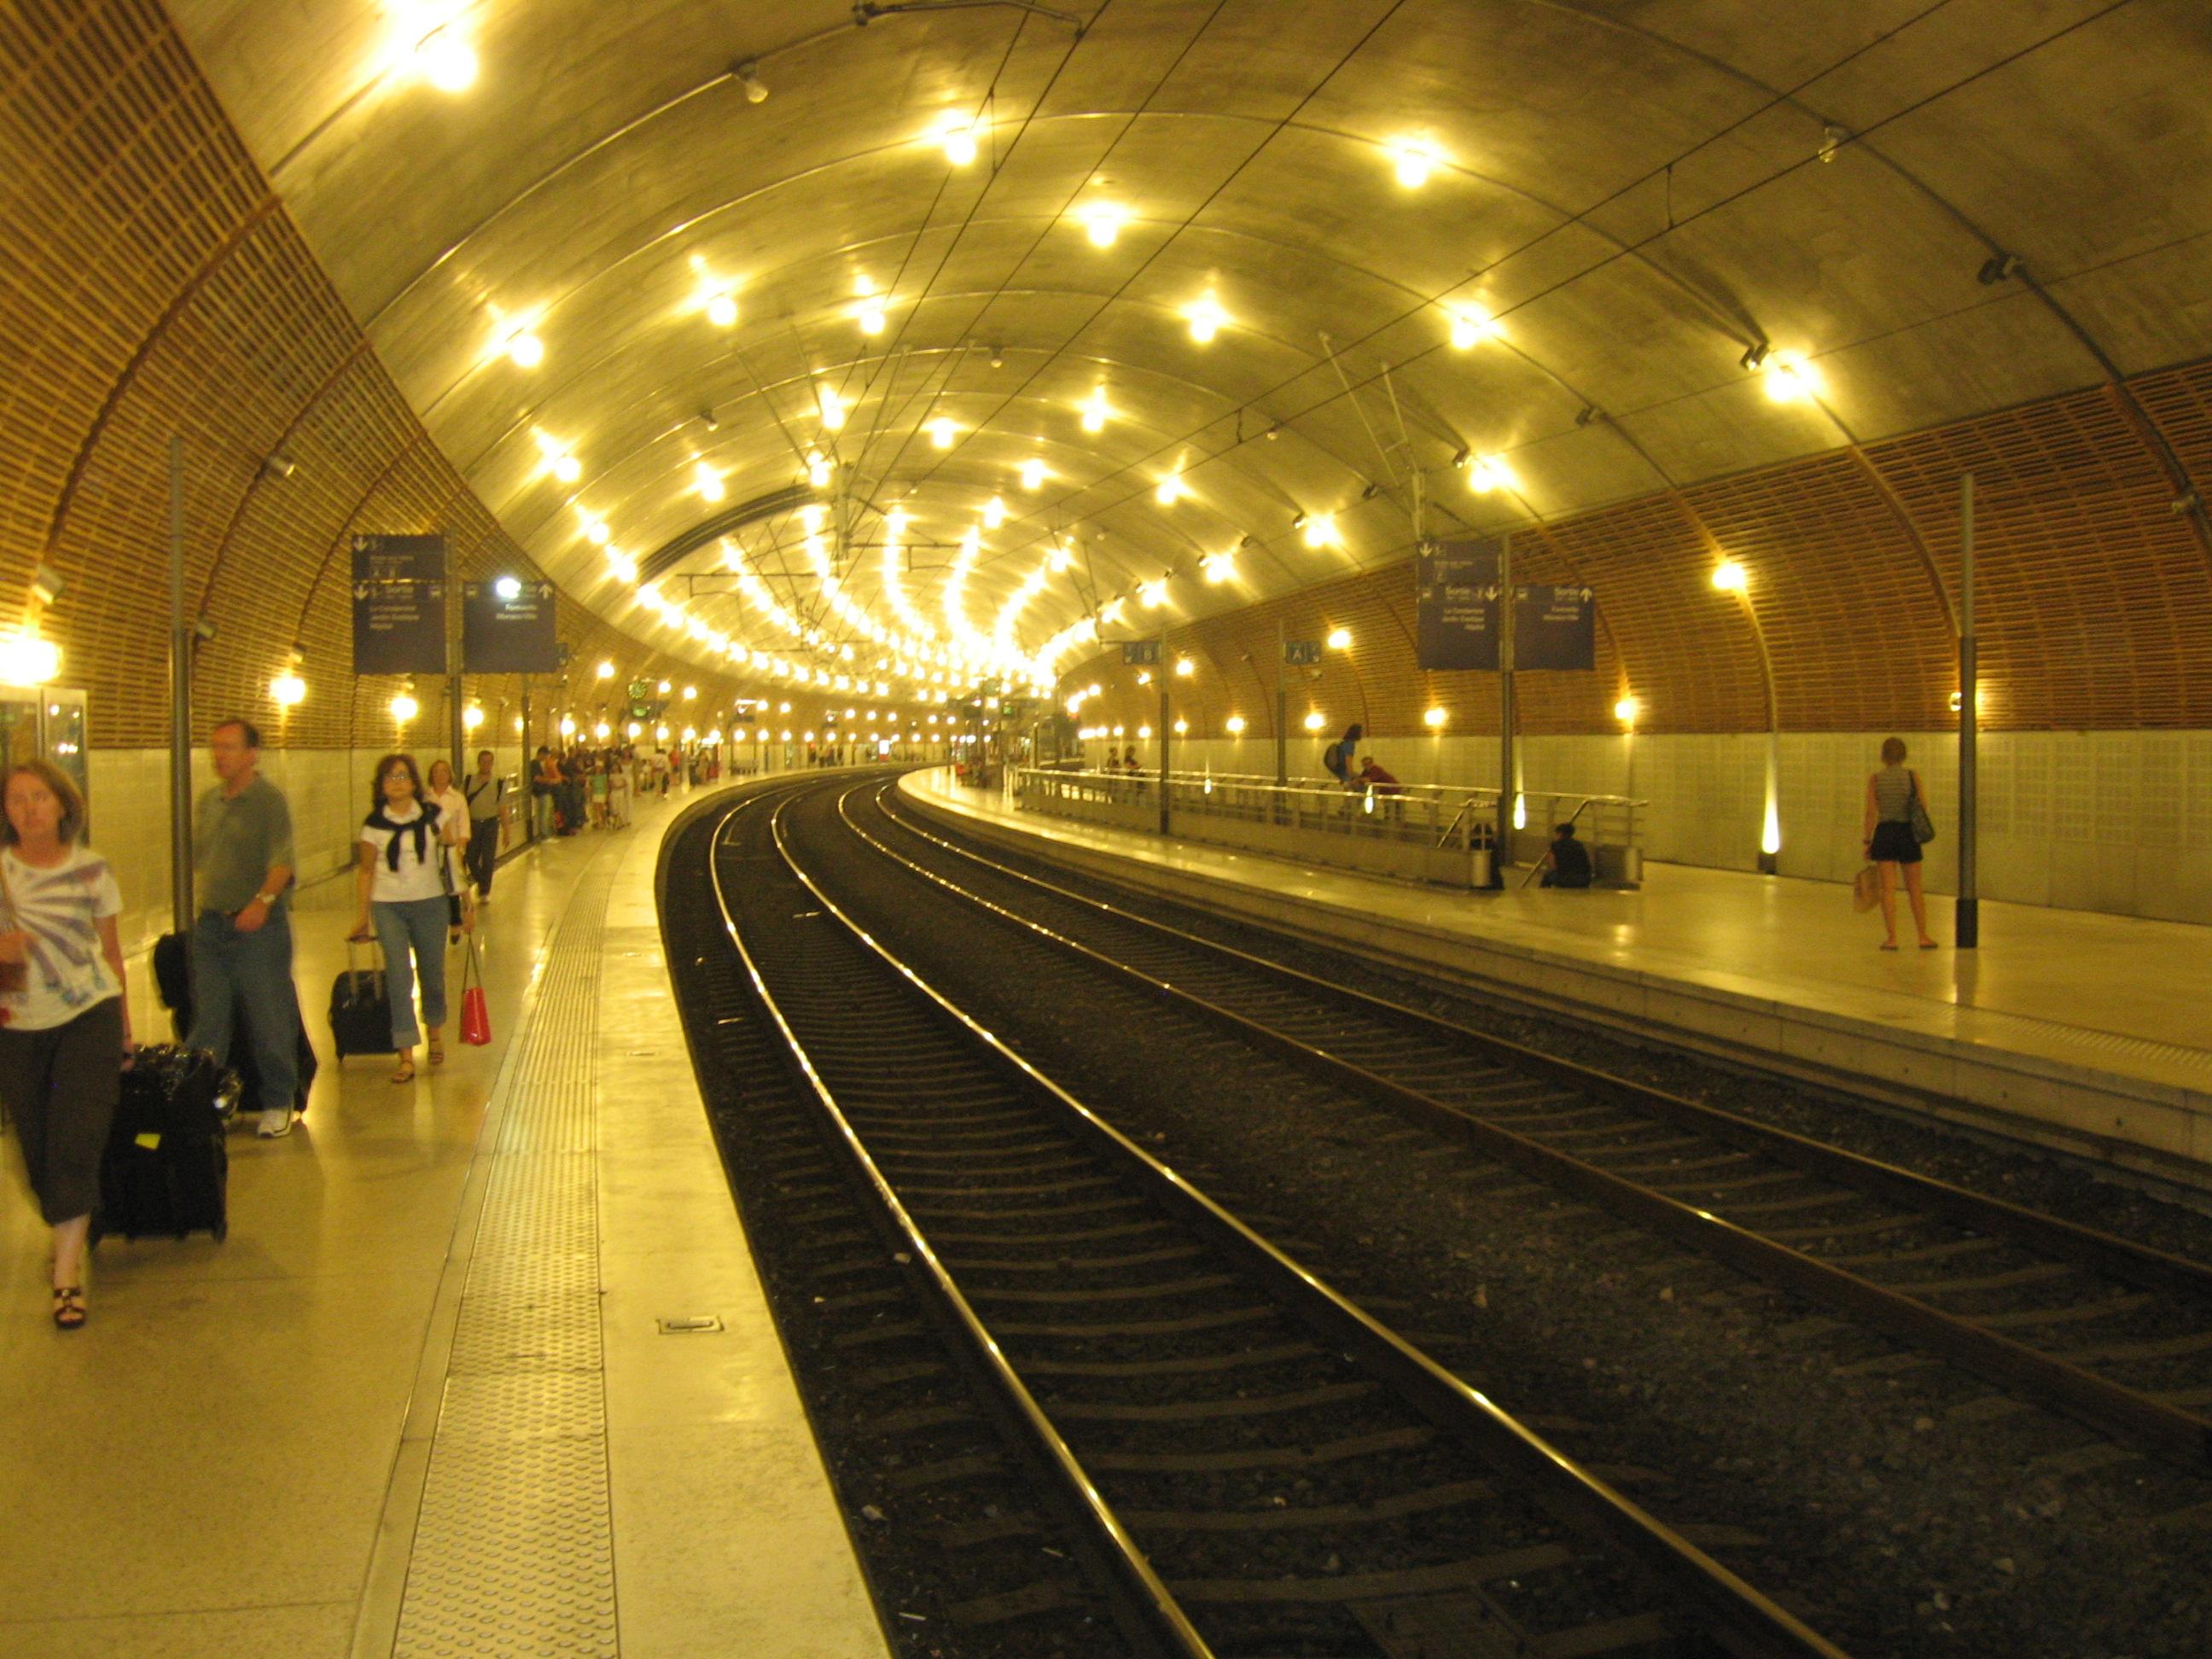 File:Monaco underground station.JPG - Wikimedia Commons